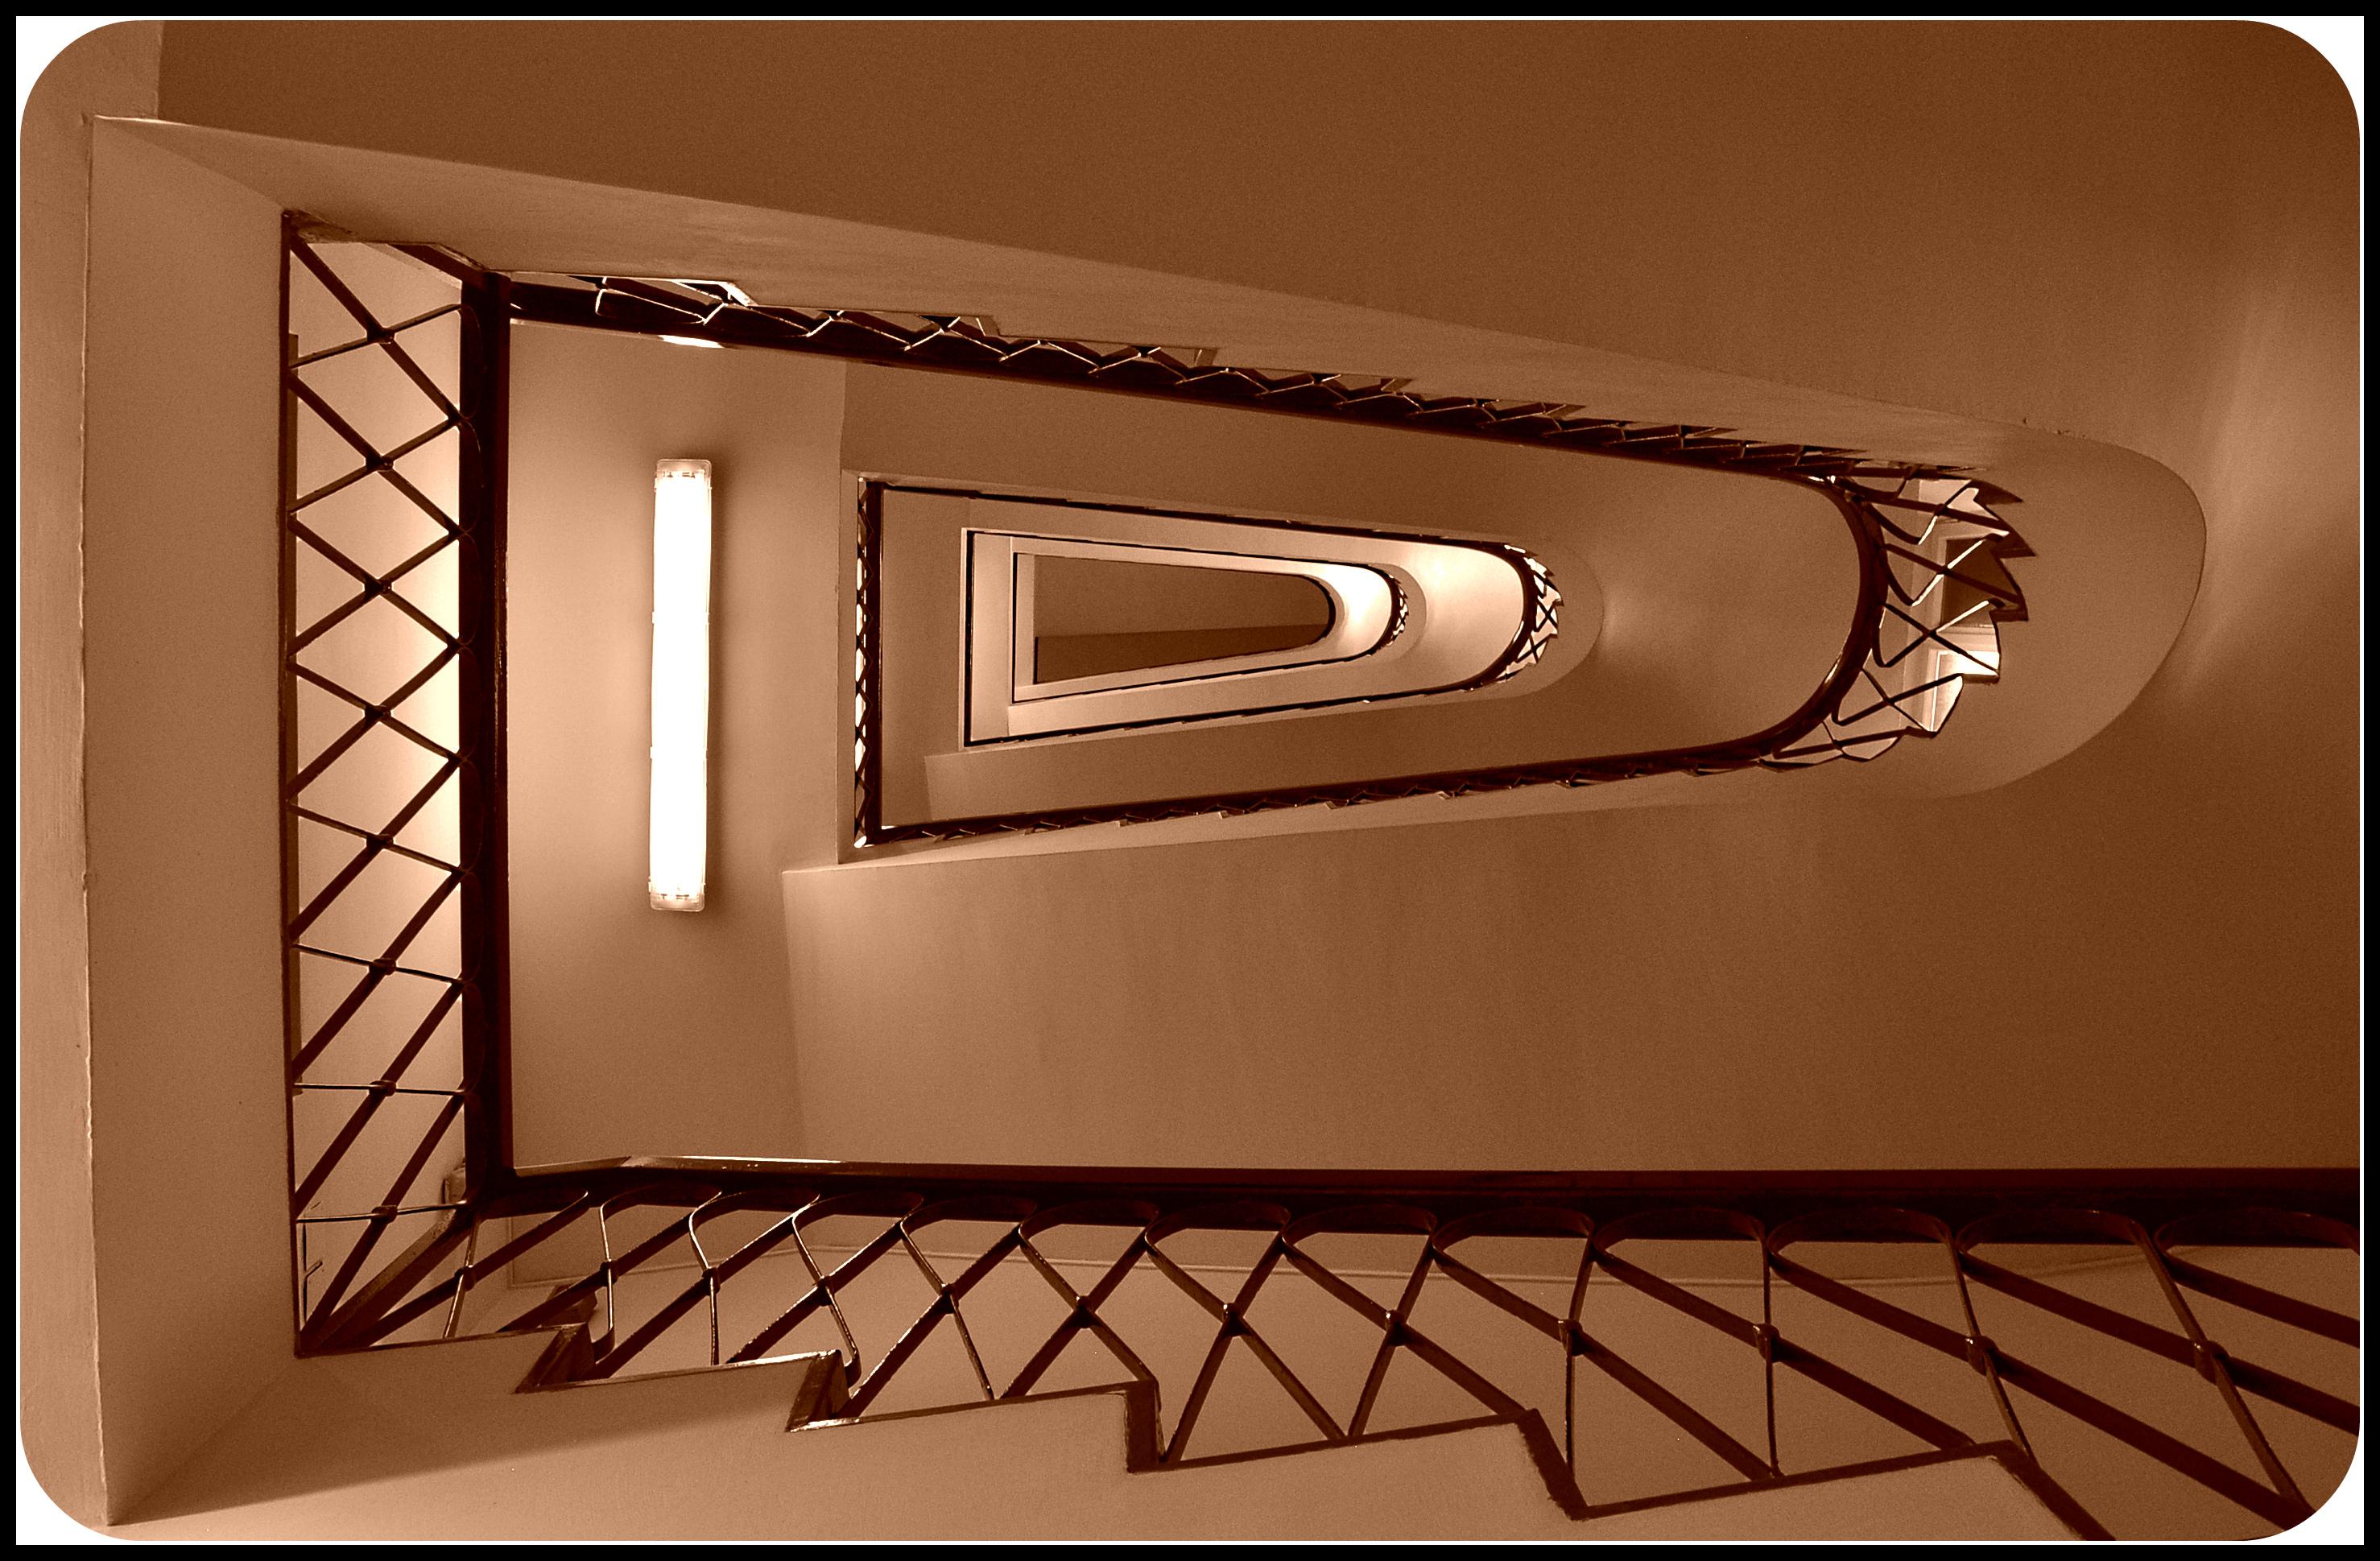 Hintergrundbilder : Treppe, Rechteck, Rahmen, Winkel, Beleuchtung ...